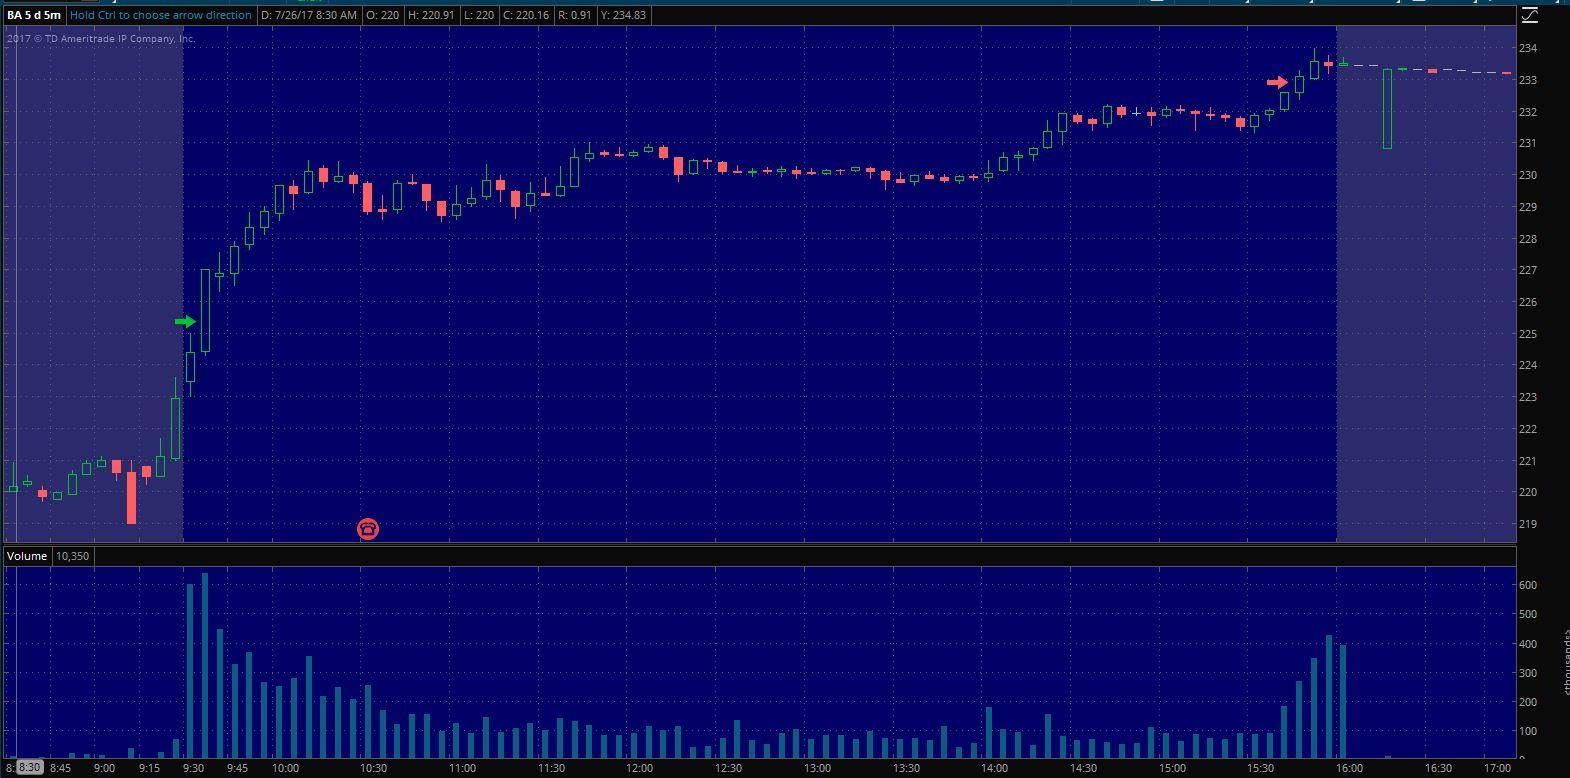 $BA Exit on 5 min. chart